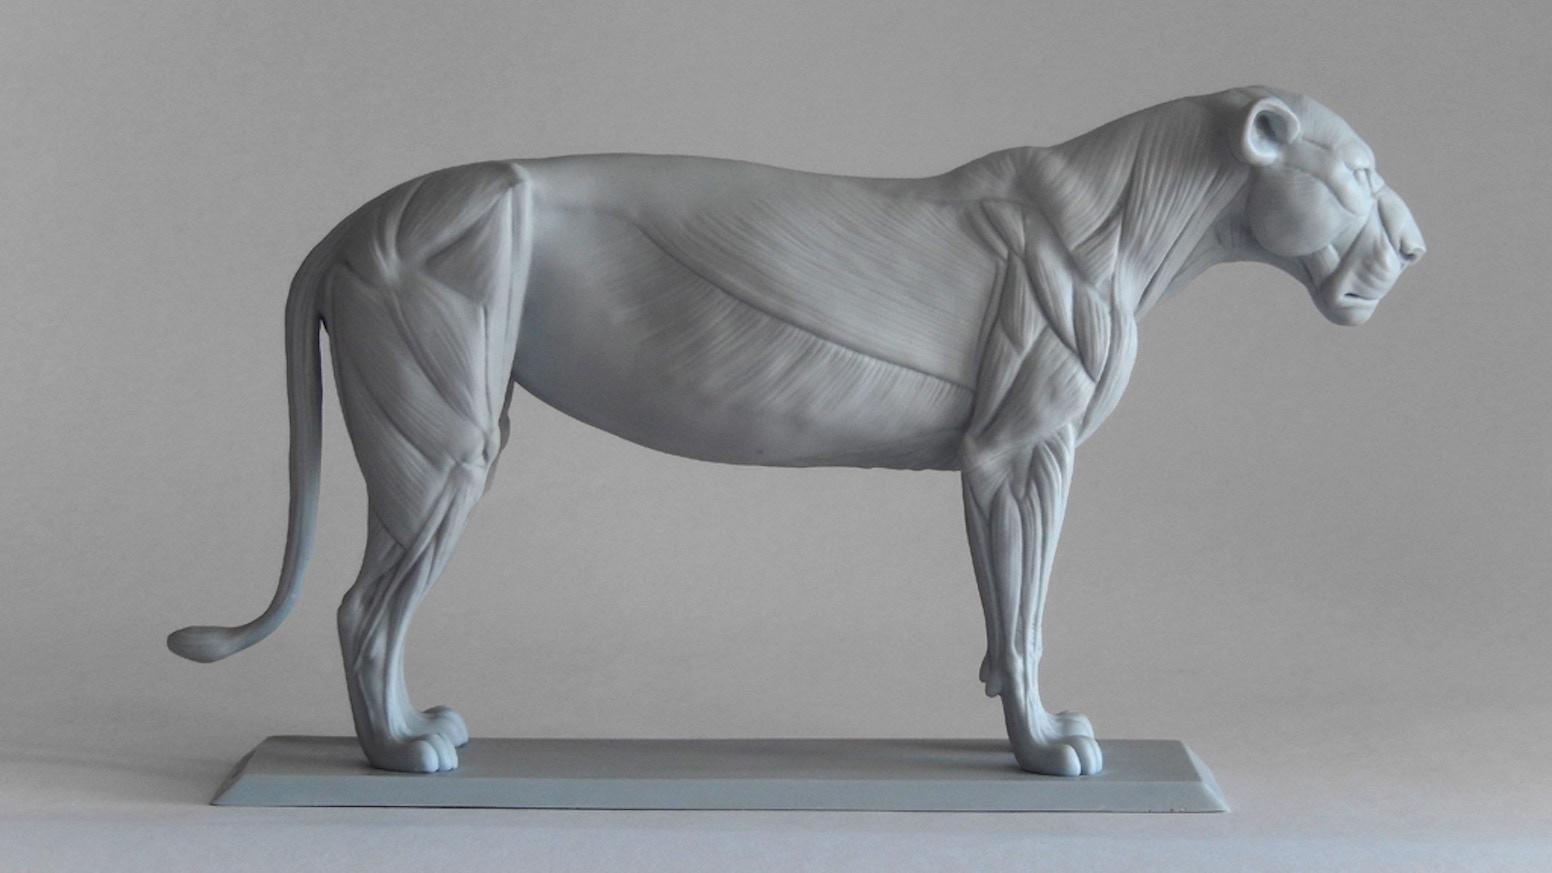 Big Cat Anatomy Sculpture - Lioness by Gabriele Pennacchioli ...